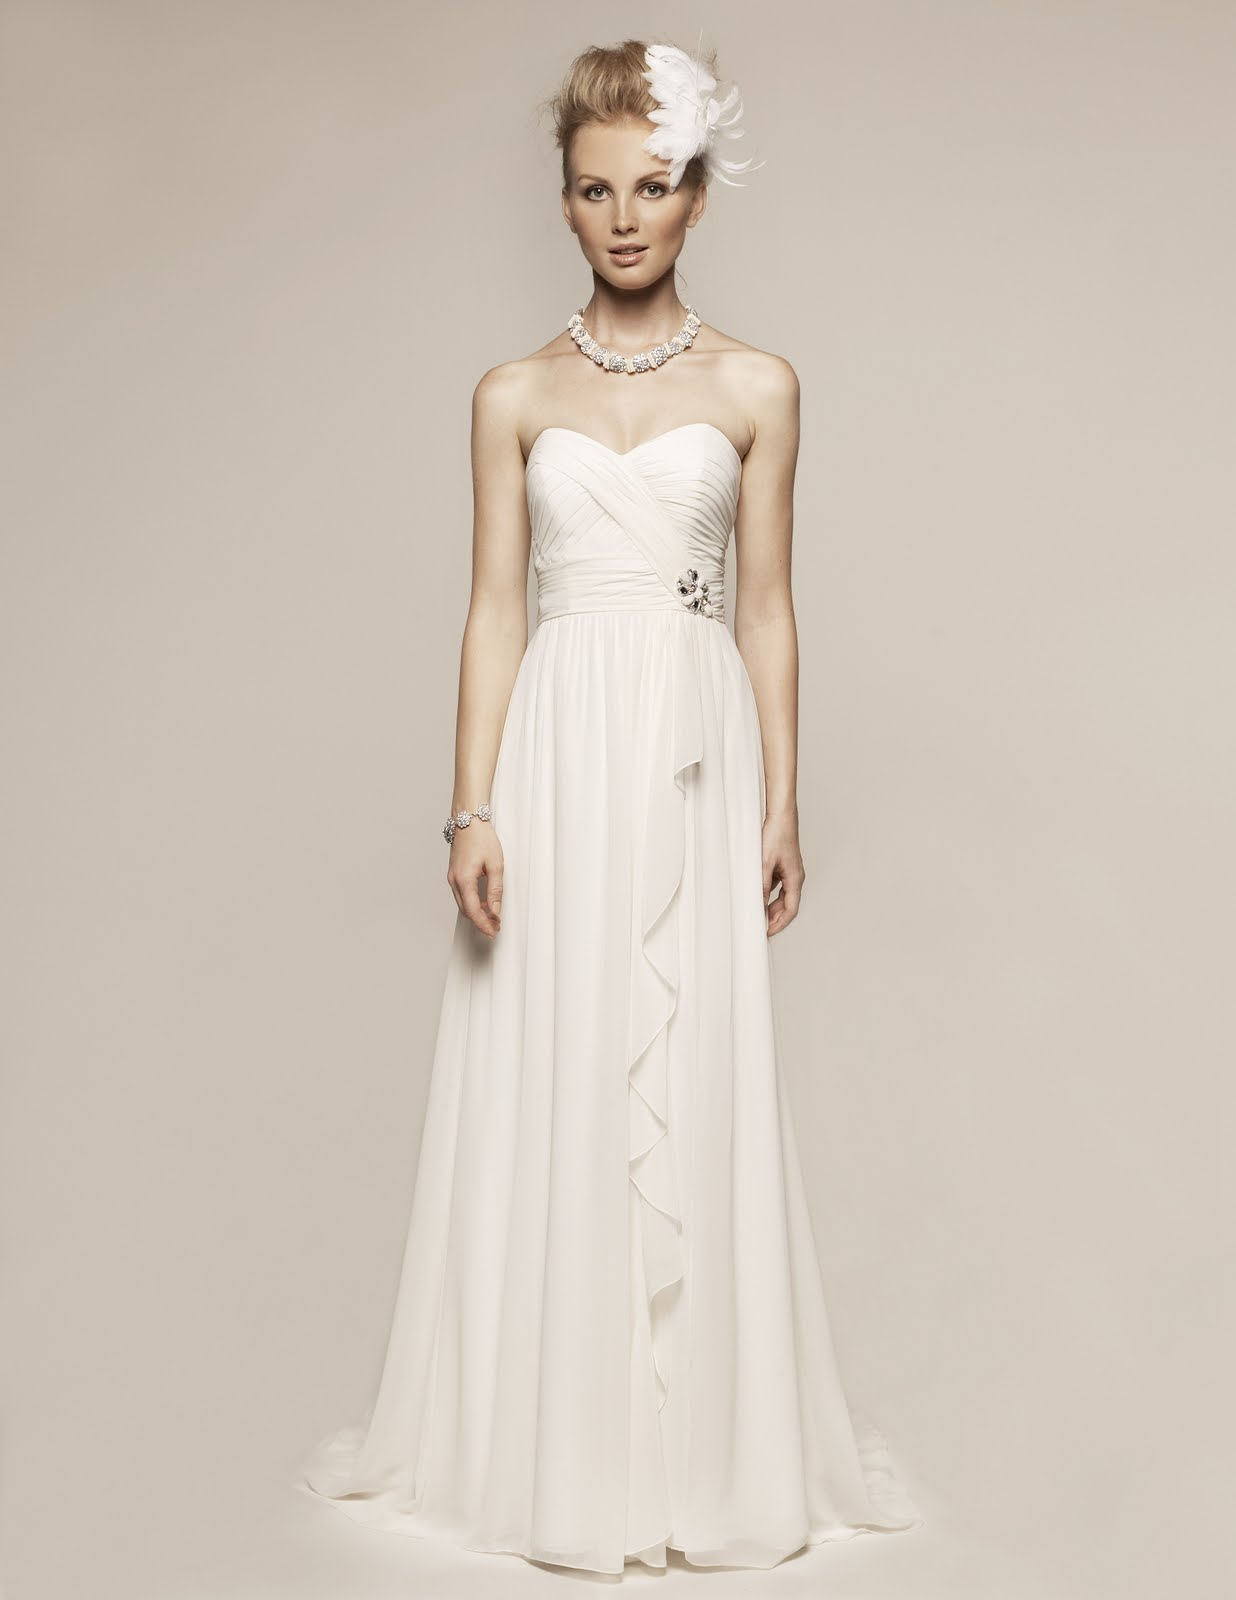 Destination Weddings Bridal Designer Offers New Options For The Modest Bride